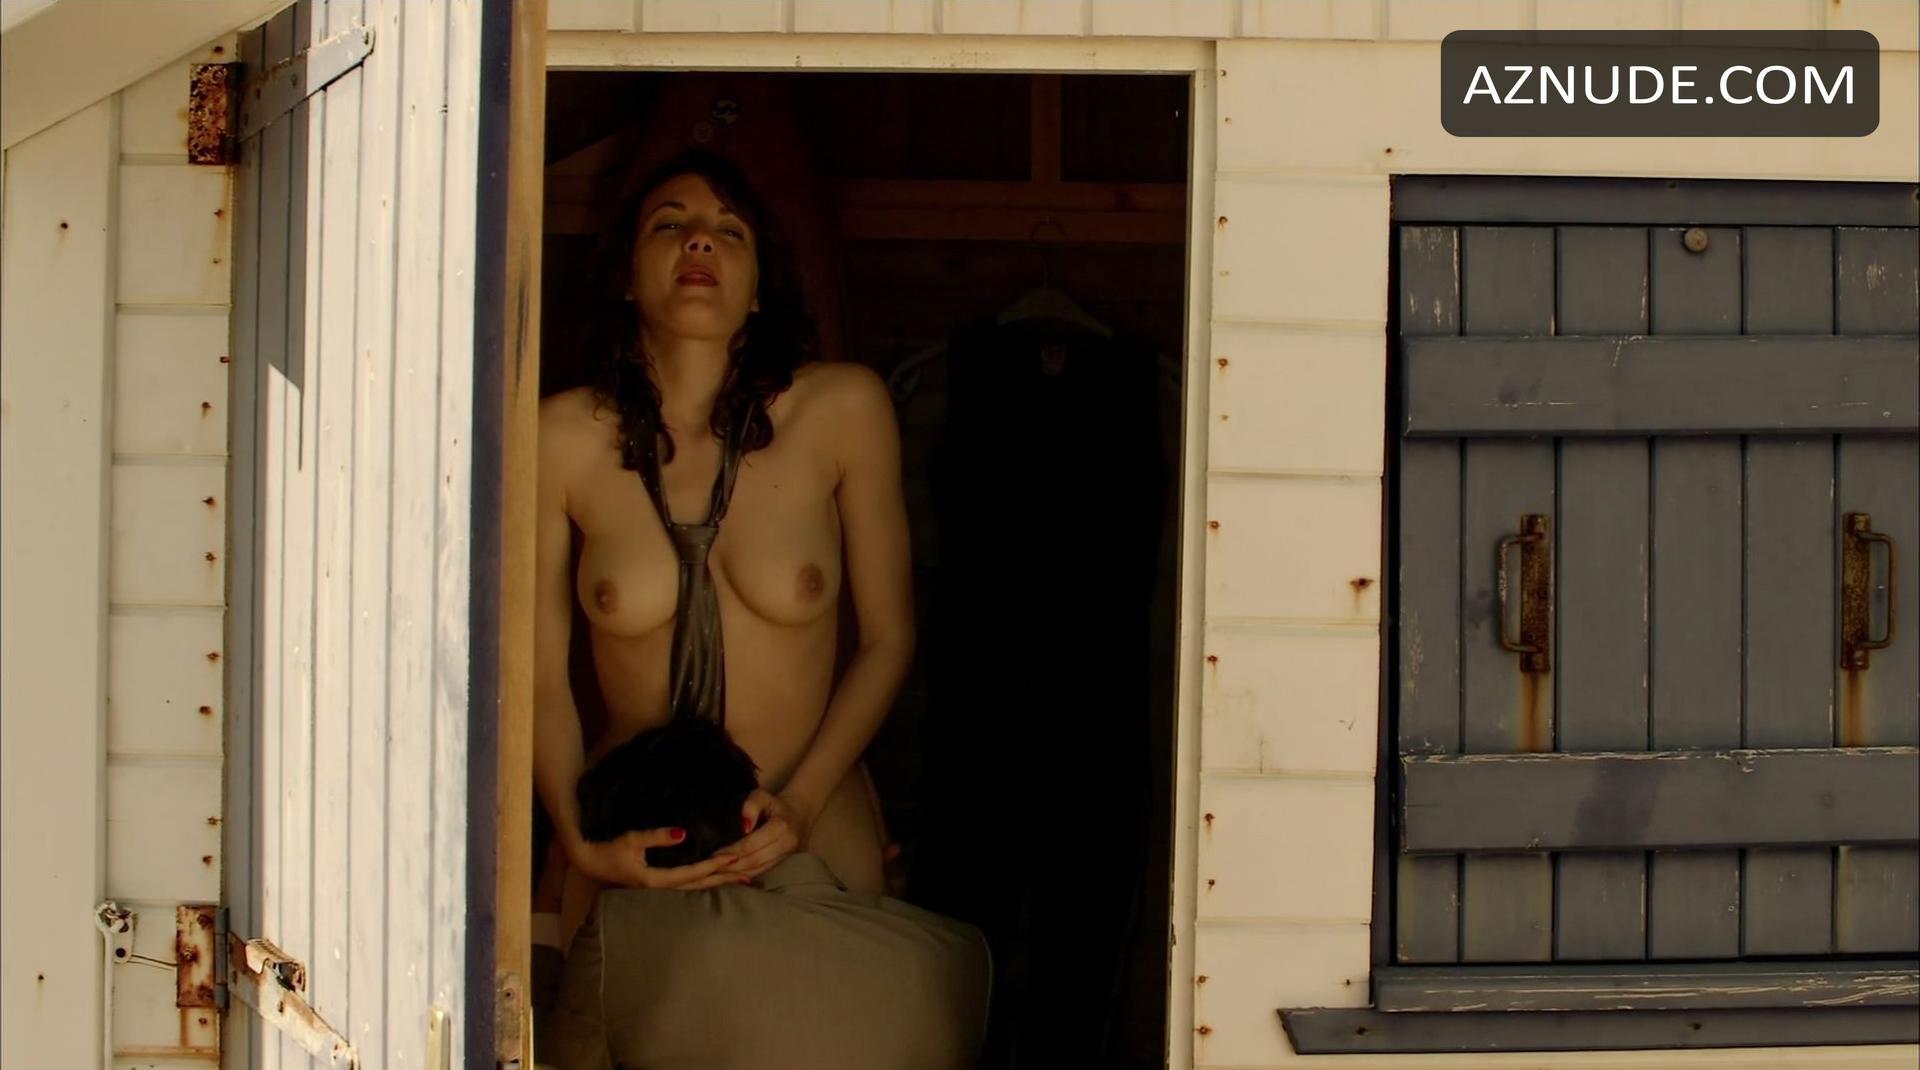 Bikini Deborah Revy naked (88 foto and video), Sexy, Fappening, Feet, cameltoe 2019